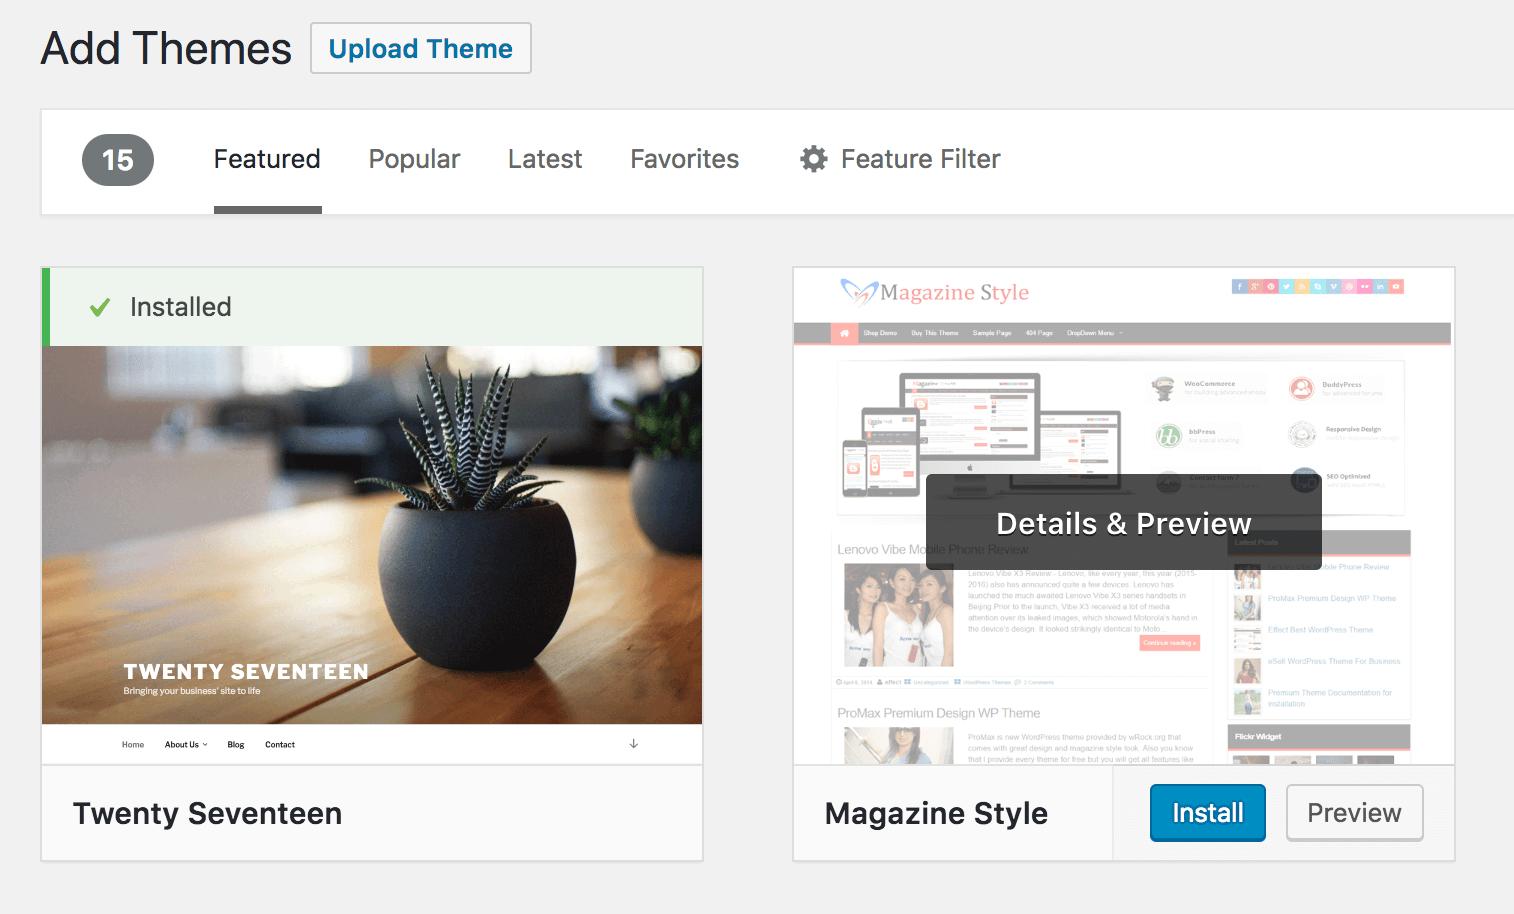 Installing a new WordPress theme.